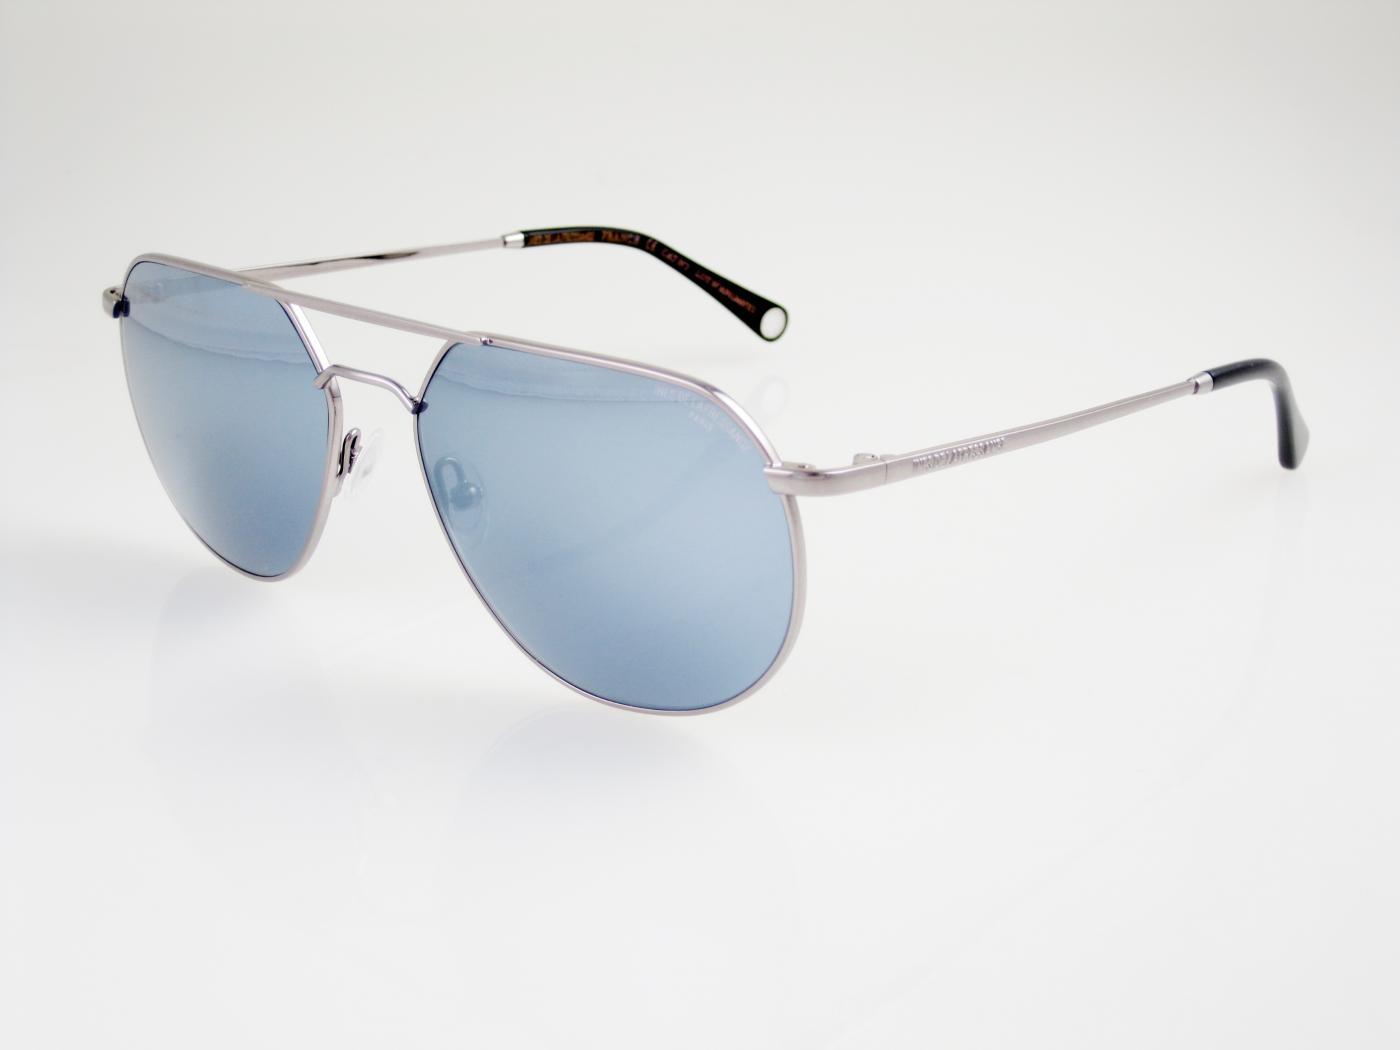 1a1901fb3 Unisex slnečné okuliare Ines de la Fressange | oftalens.sk